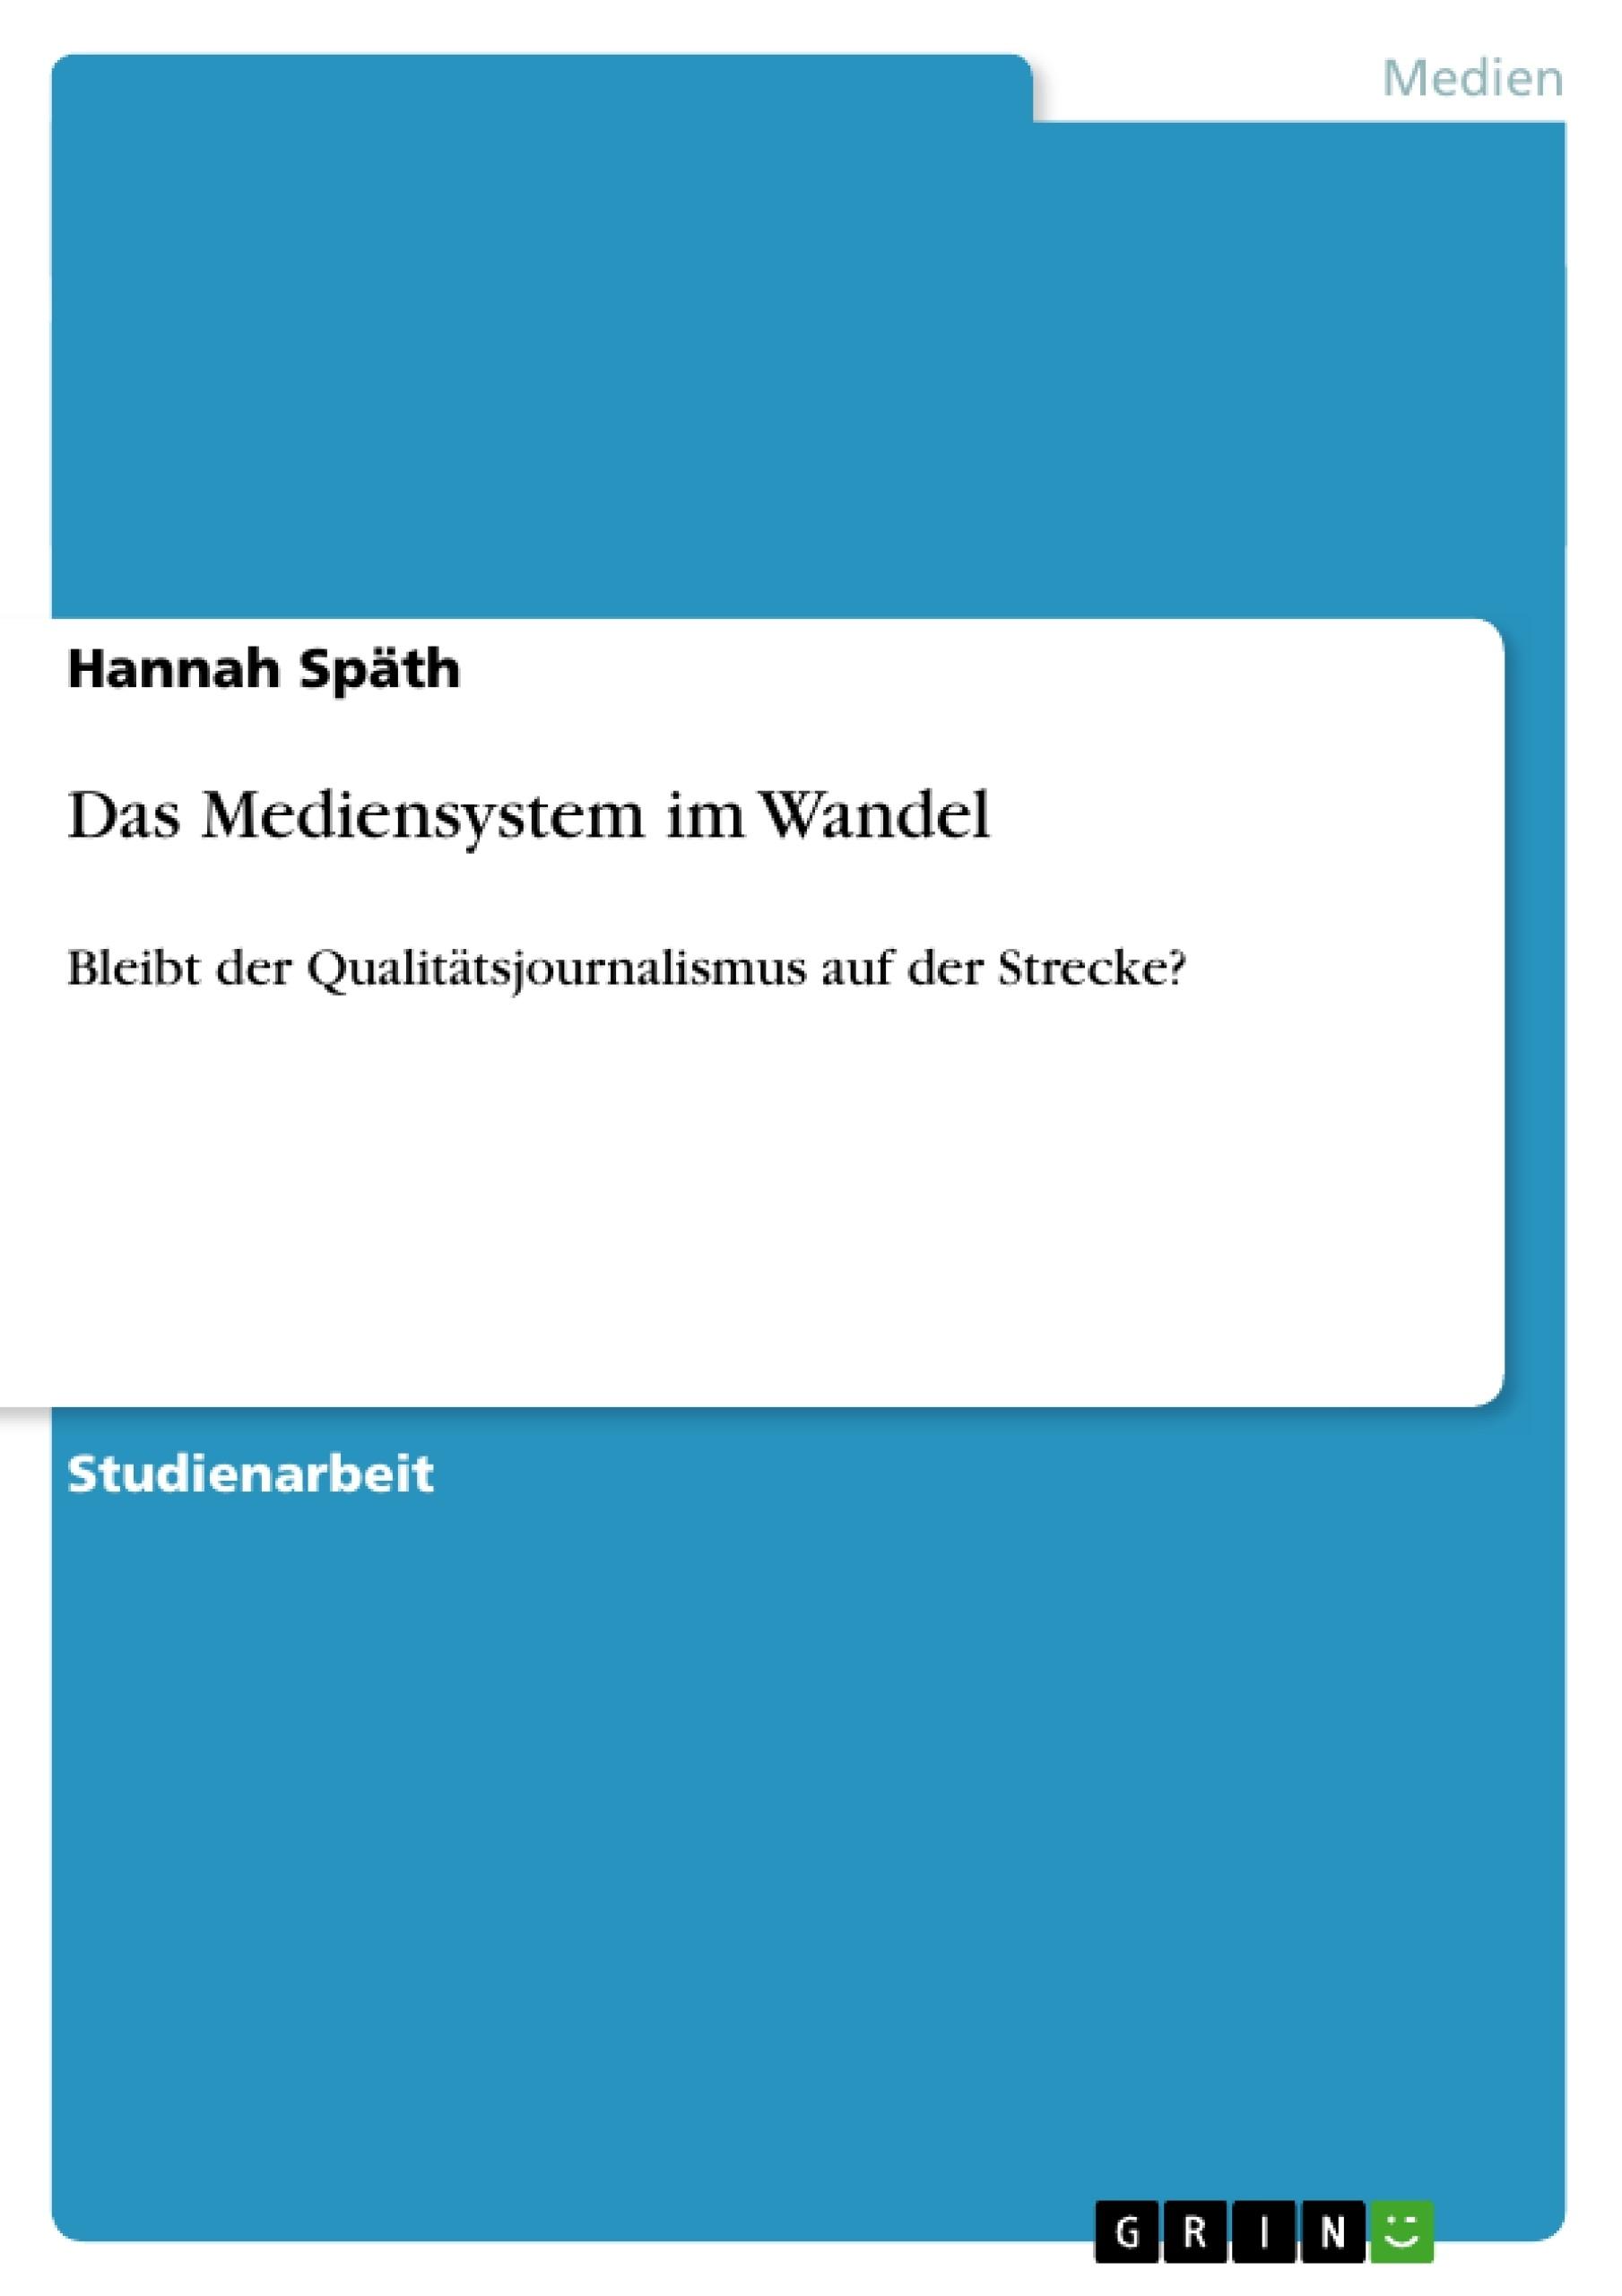 Titel: Das Mediensystem im Wandel